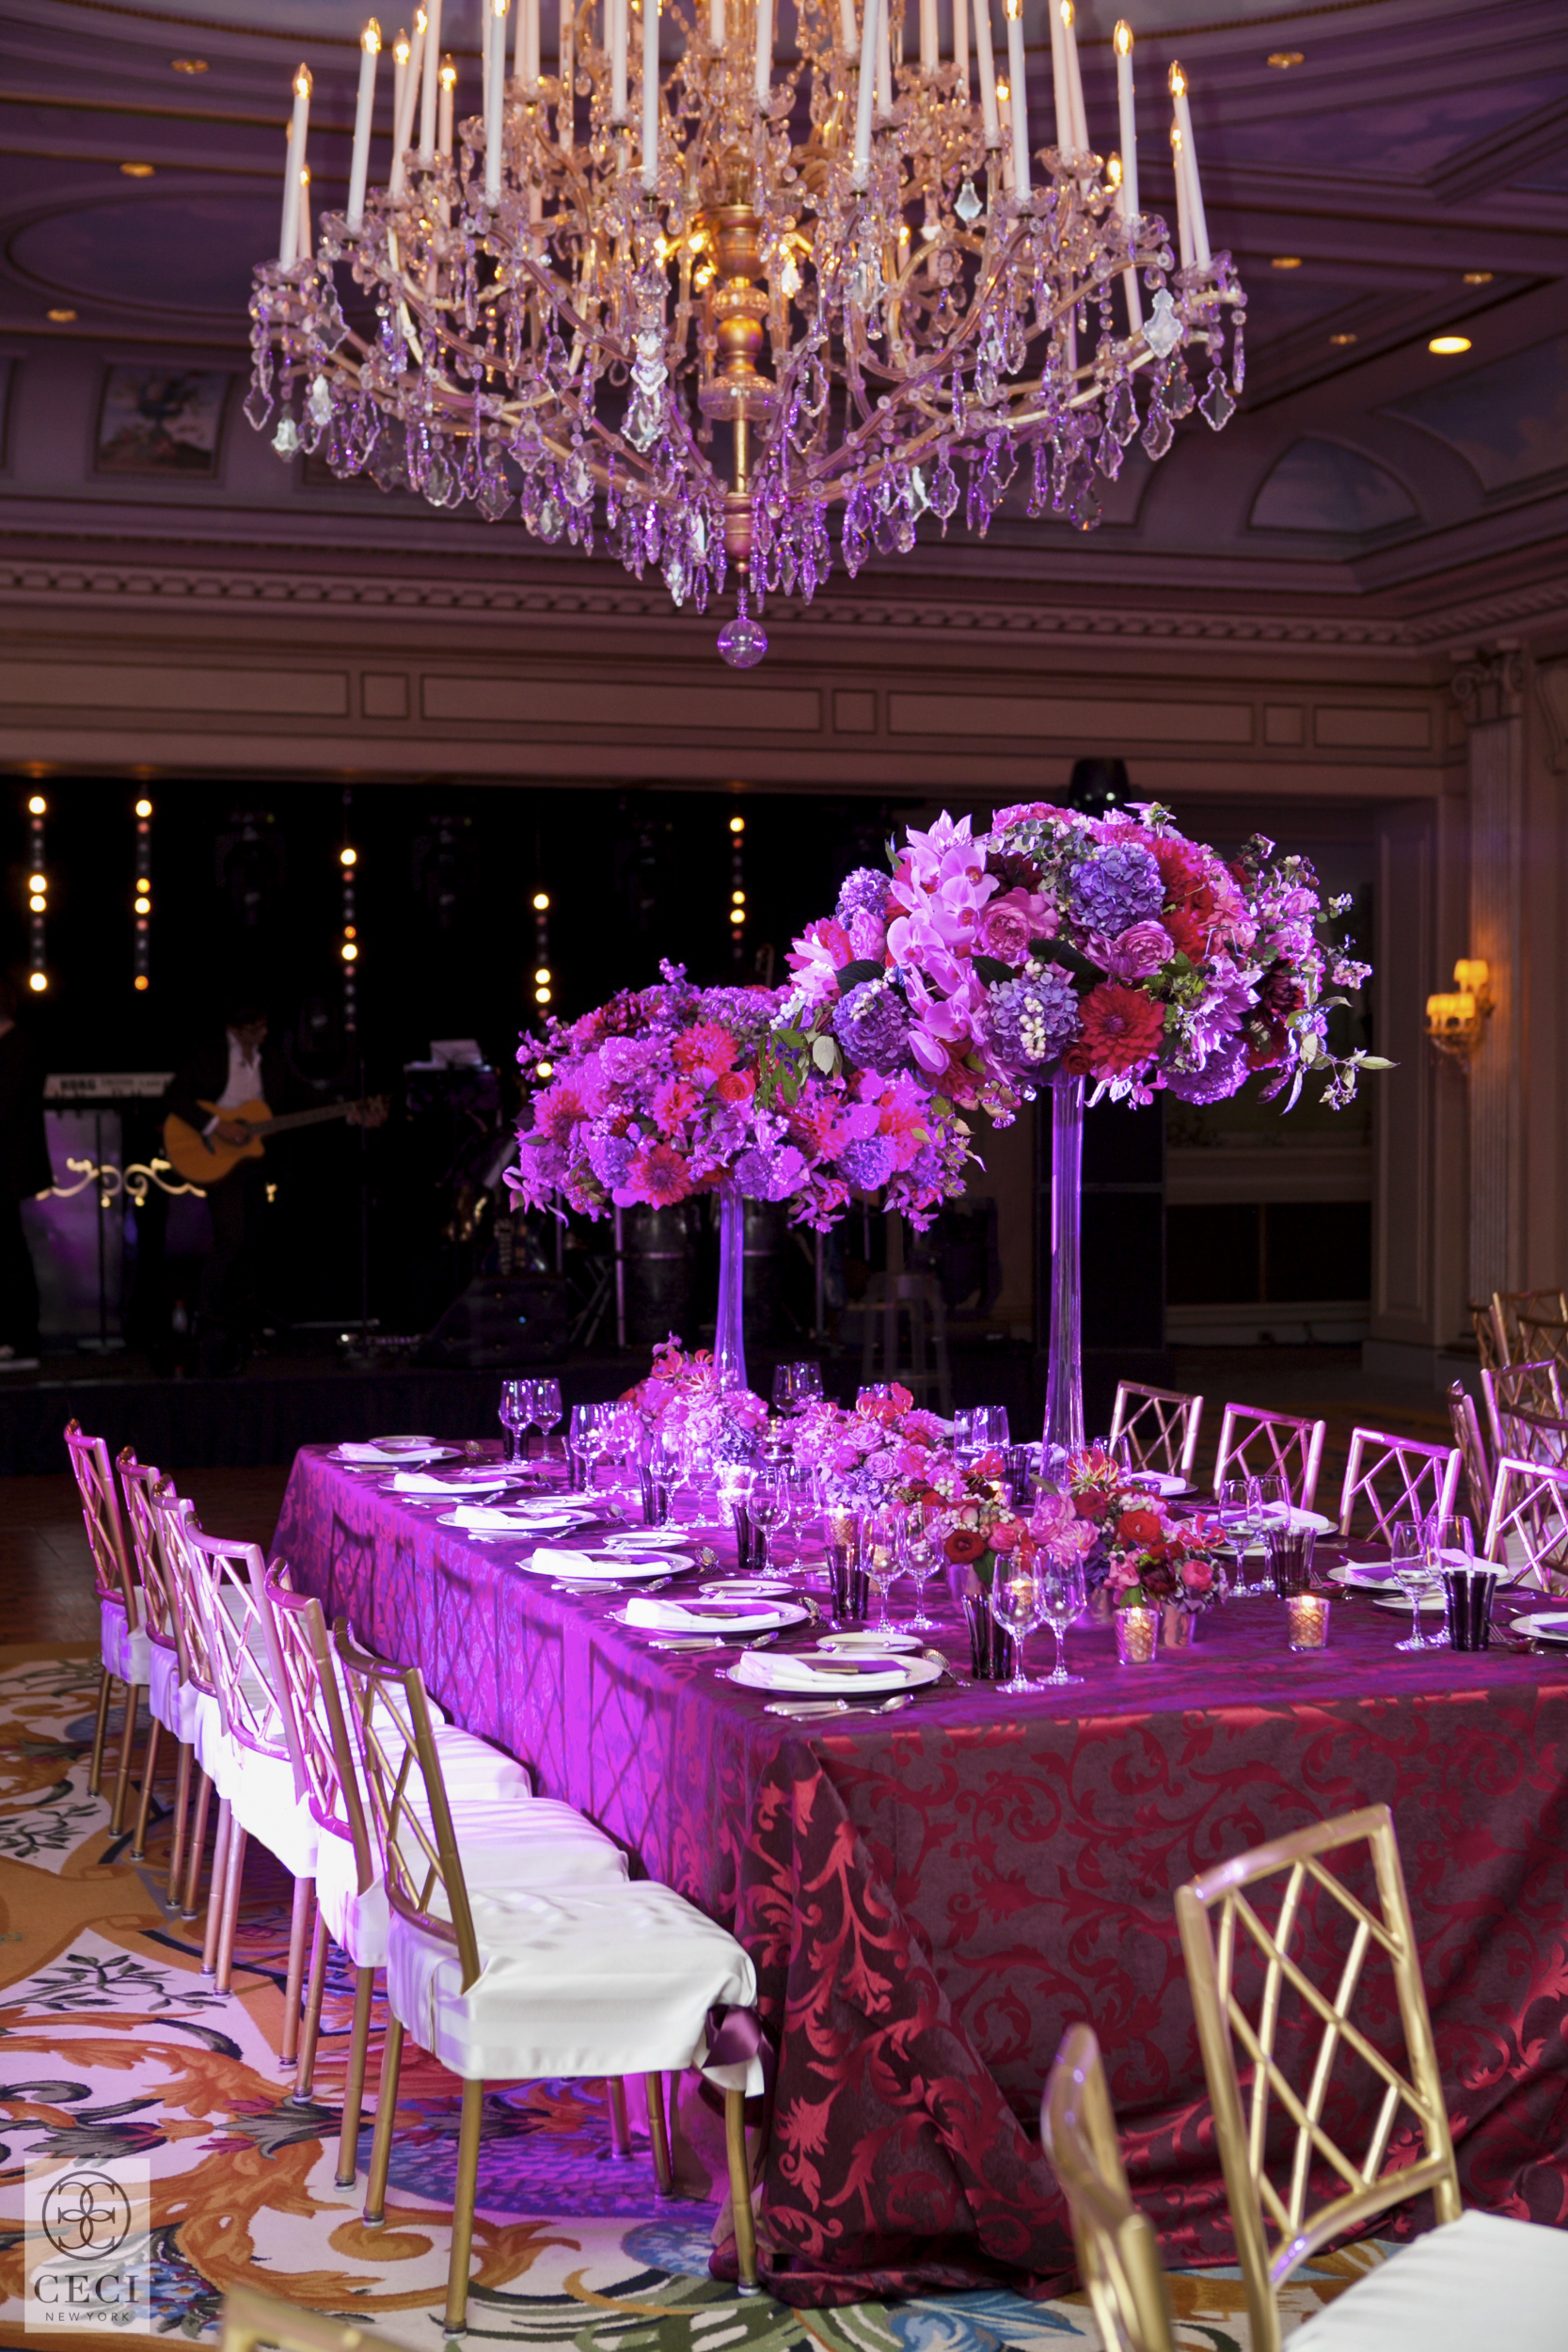 ceci_new_york_lucas_somoza_purple_regal_wediding_birthday_commitment_ceremony_gold-14.jpg